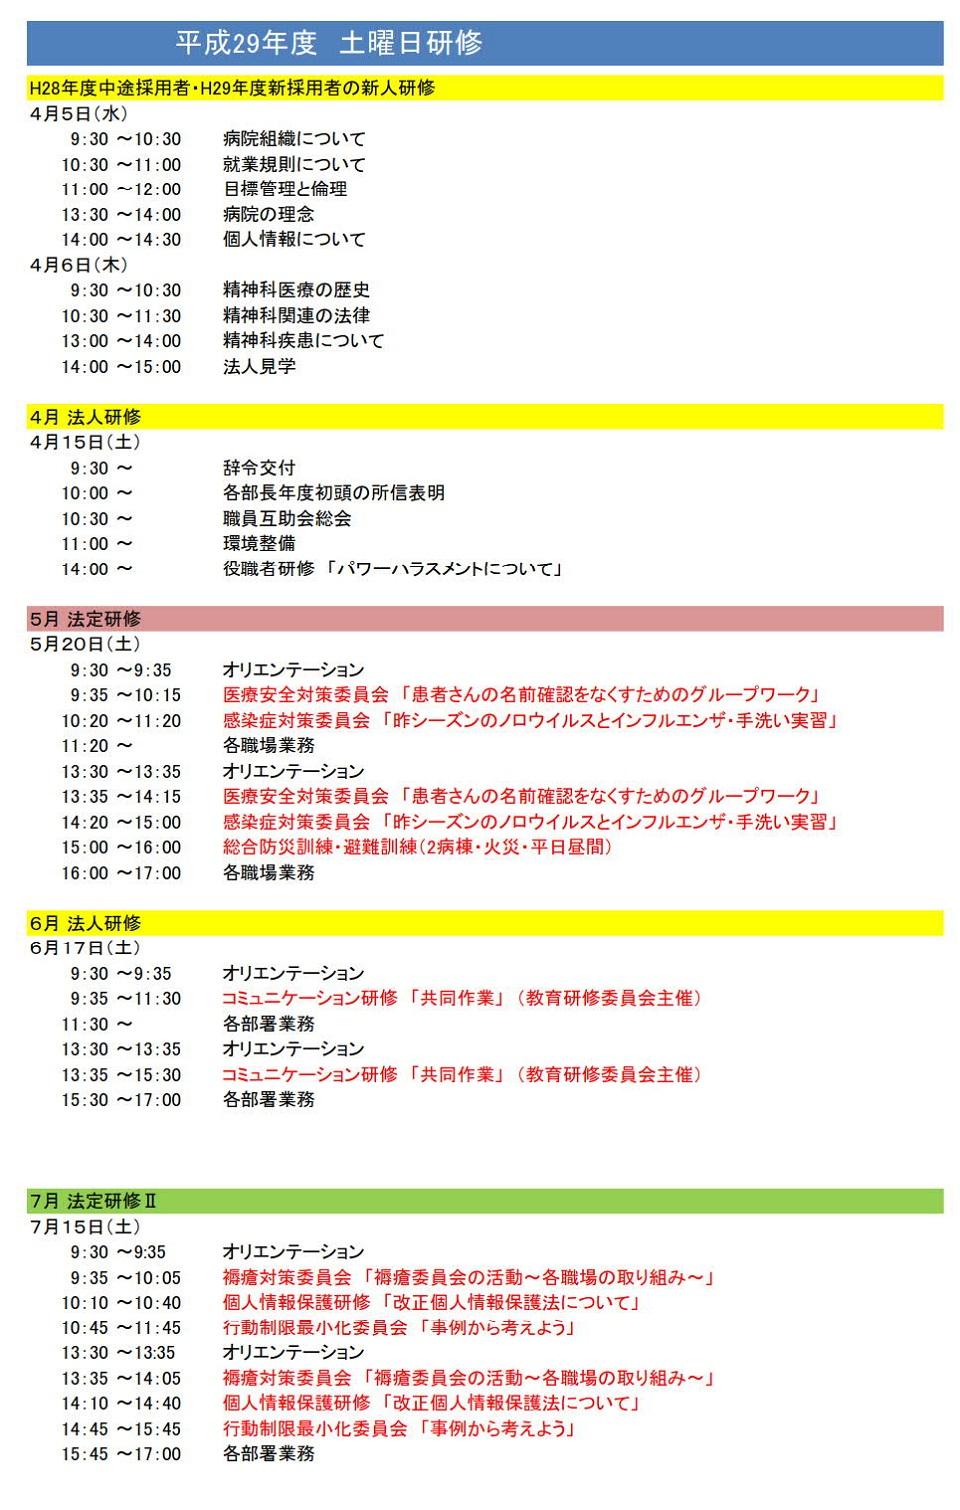 H28~H29土曜研修実績_1